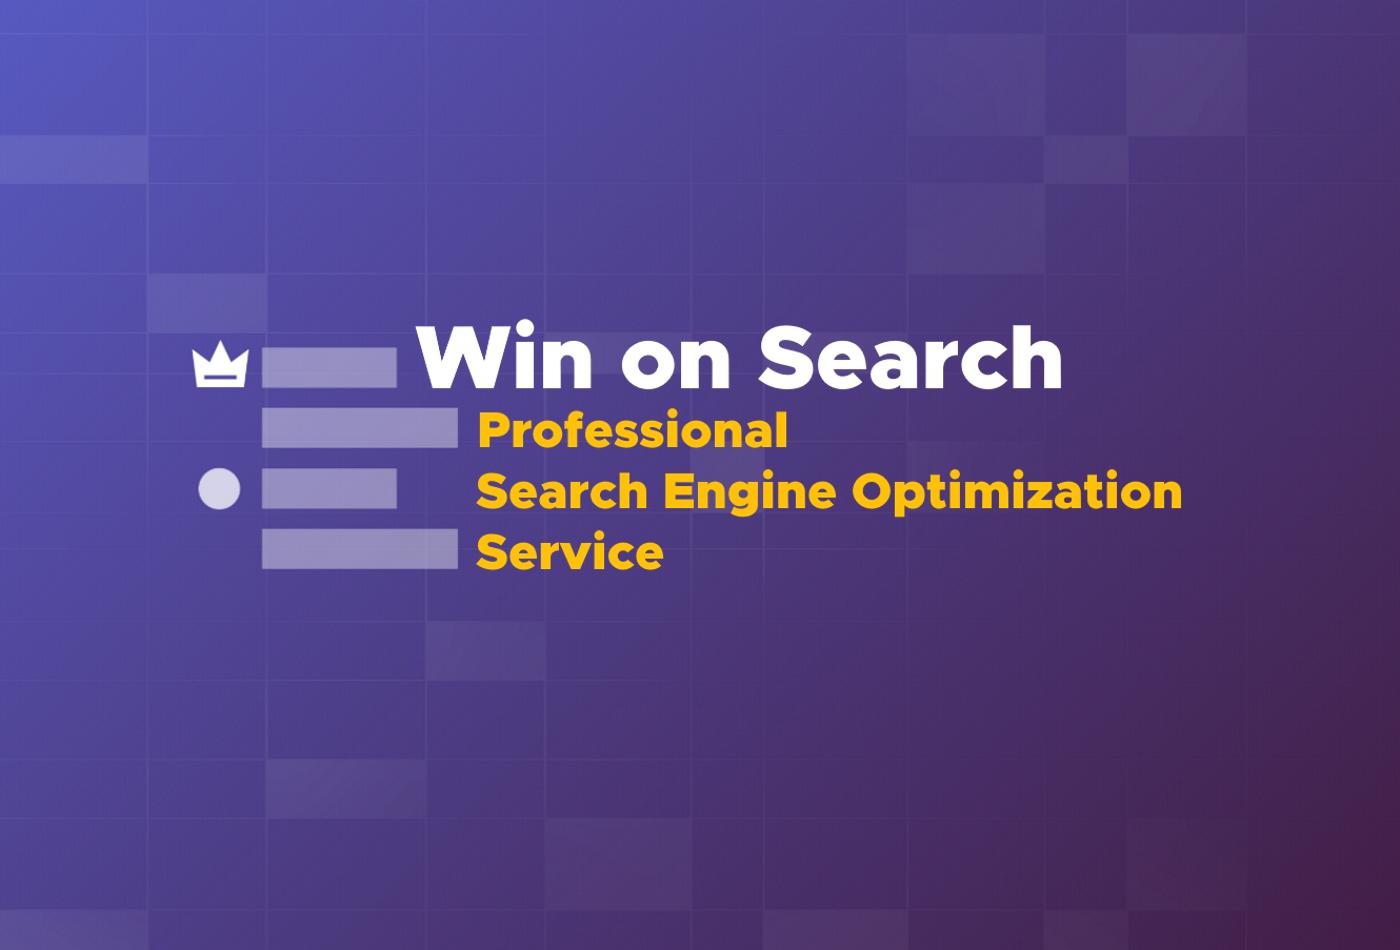 Professional Search Engine Optimization service